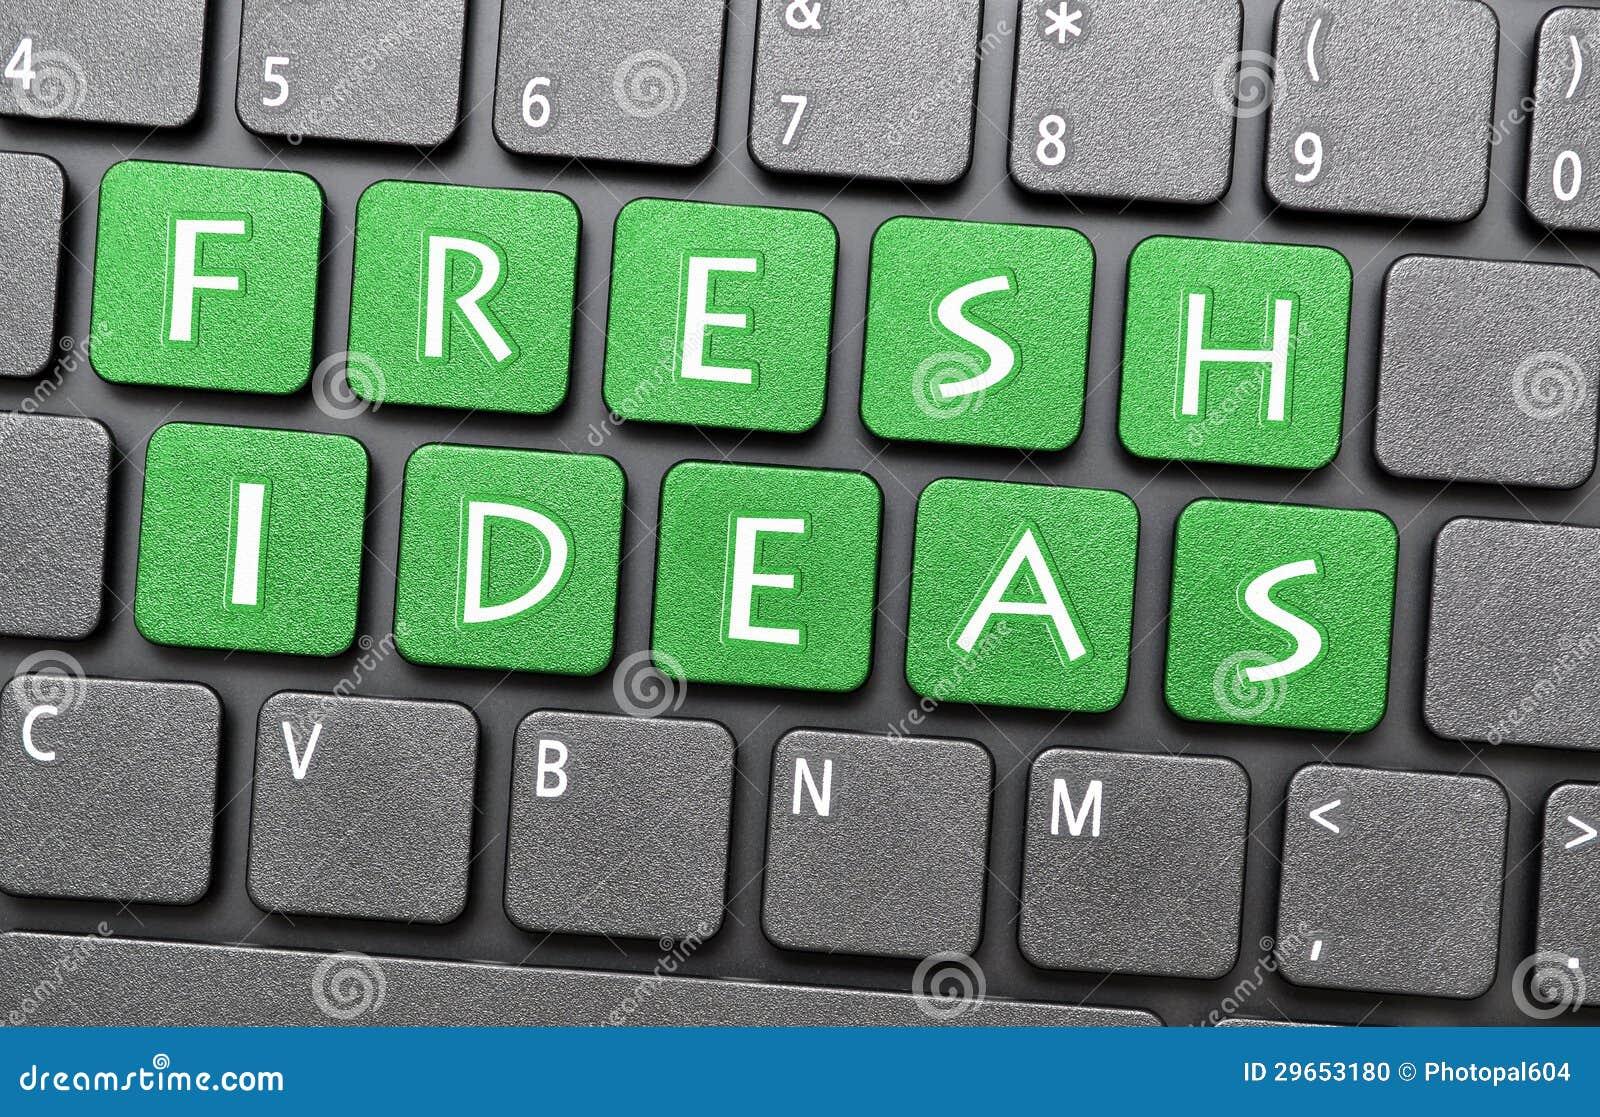 Свежие идеи